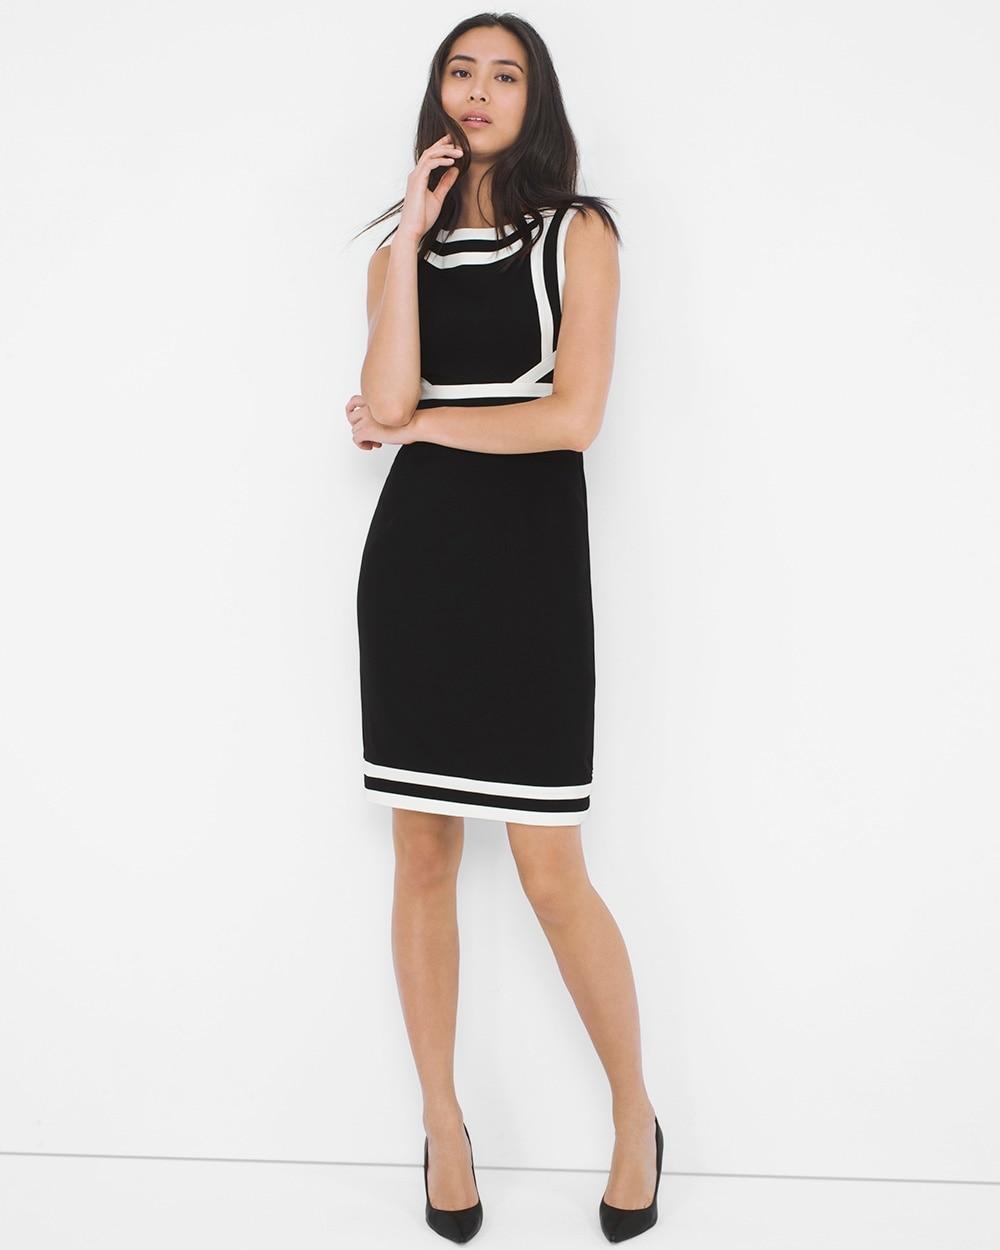 finest selection shopping skate shoes Contrast Sheath Dress - Shop Women's Work Attire & Professional ...